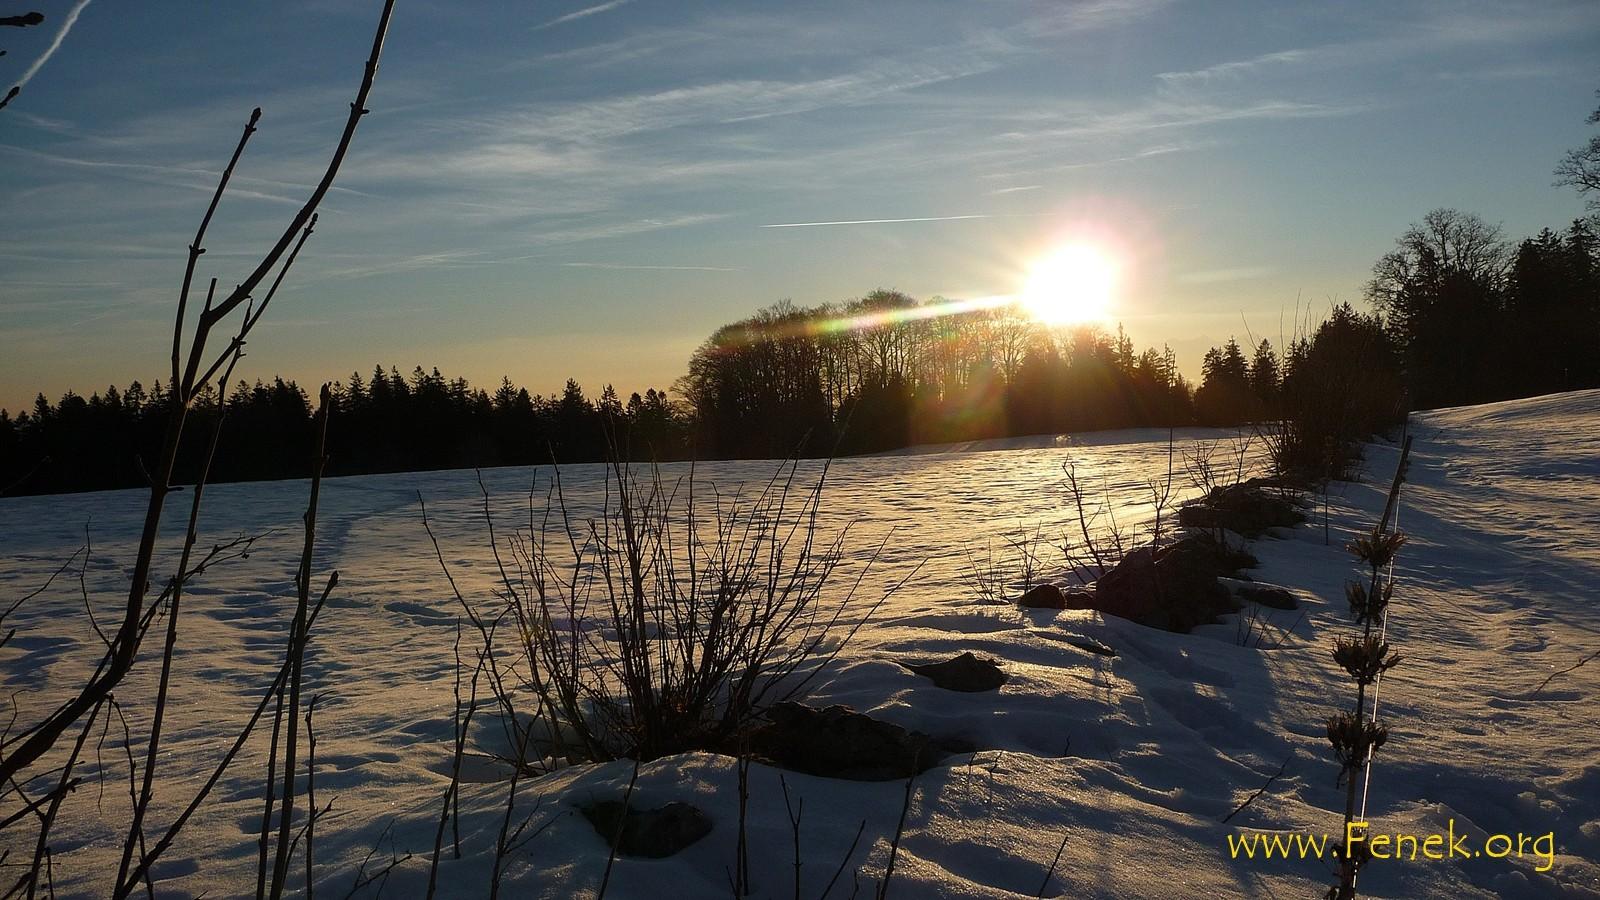 willkommen helle Sonne!!